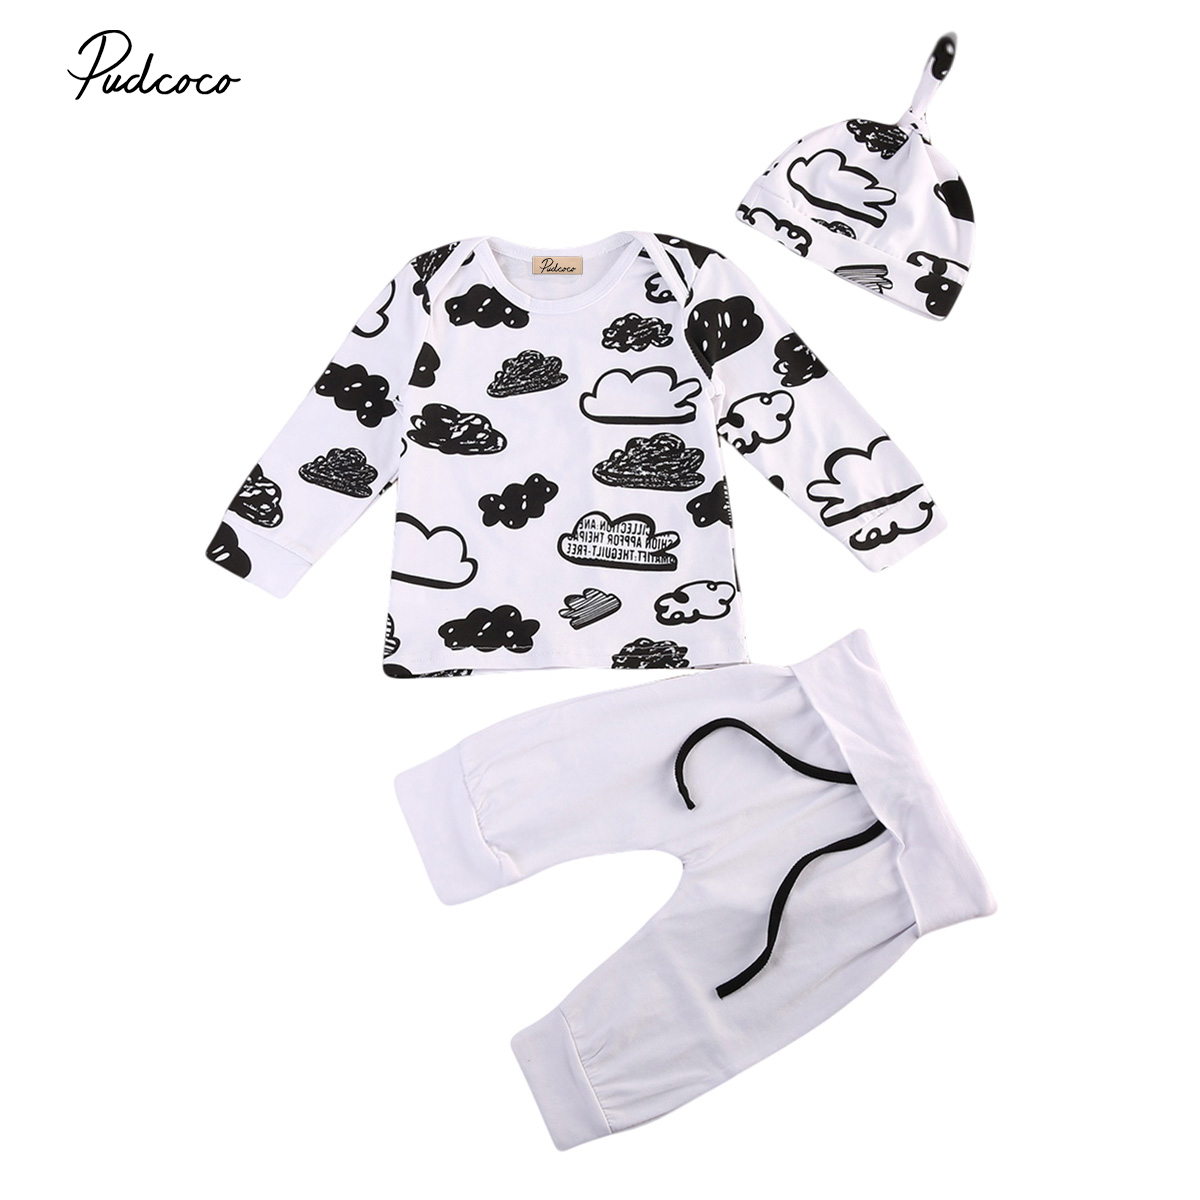 Newborn Infant Baby Suit Girl Boy Cloud Print T Shirt Tops+Pants Outfit Clothes